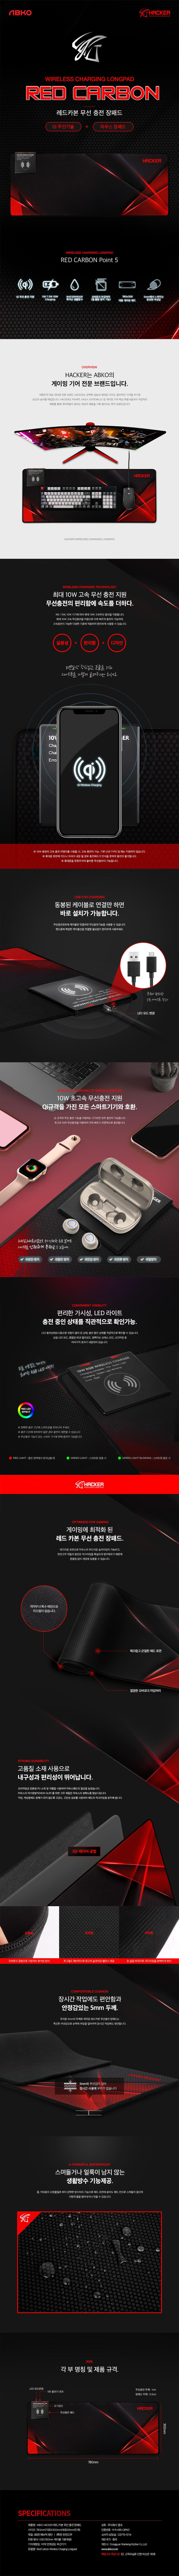 ABKO HACKER 레드 카본 무선 충전 장패드